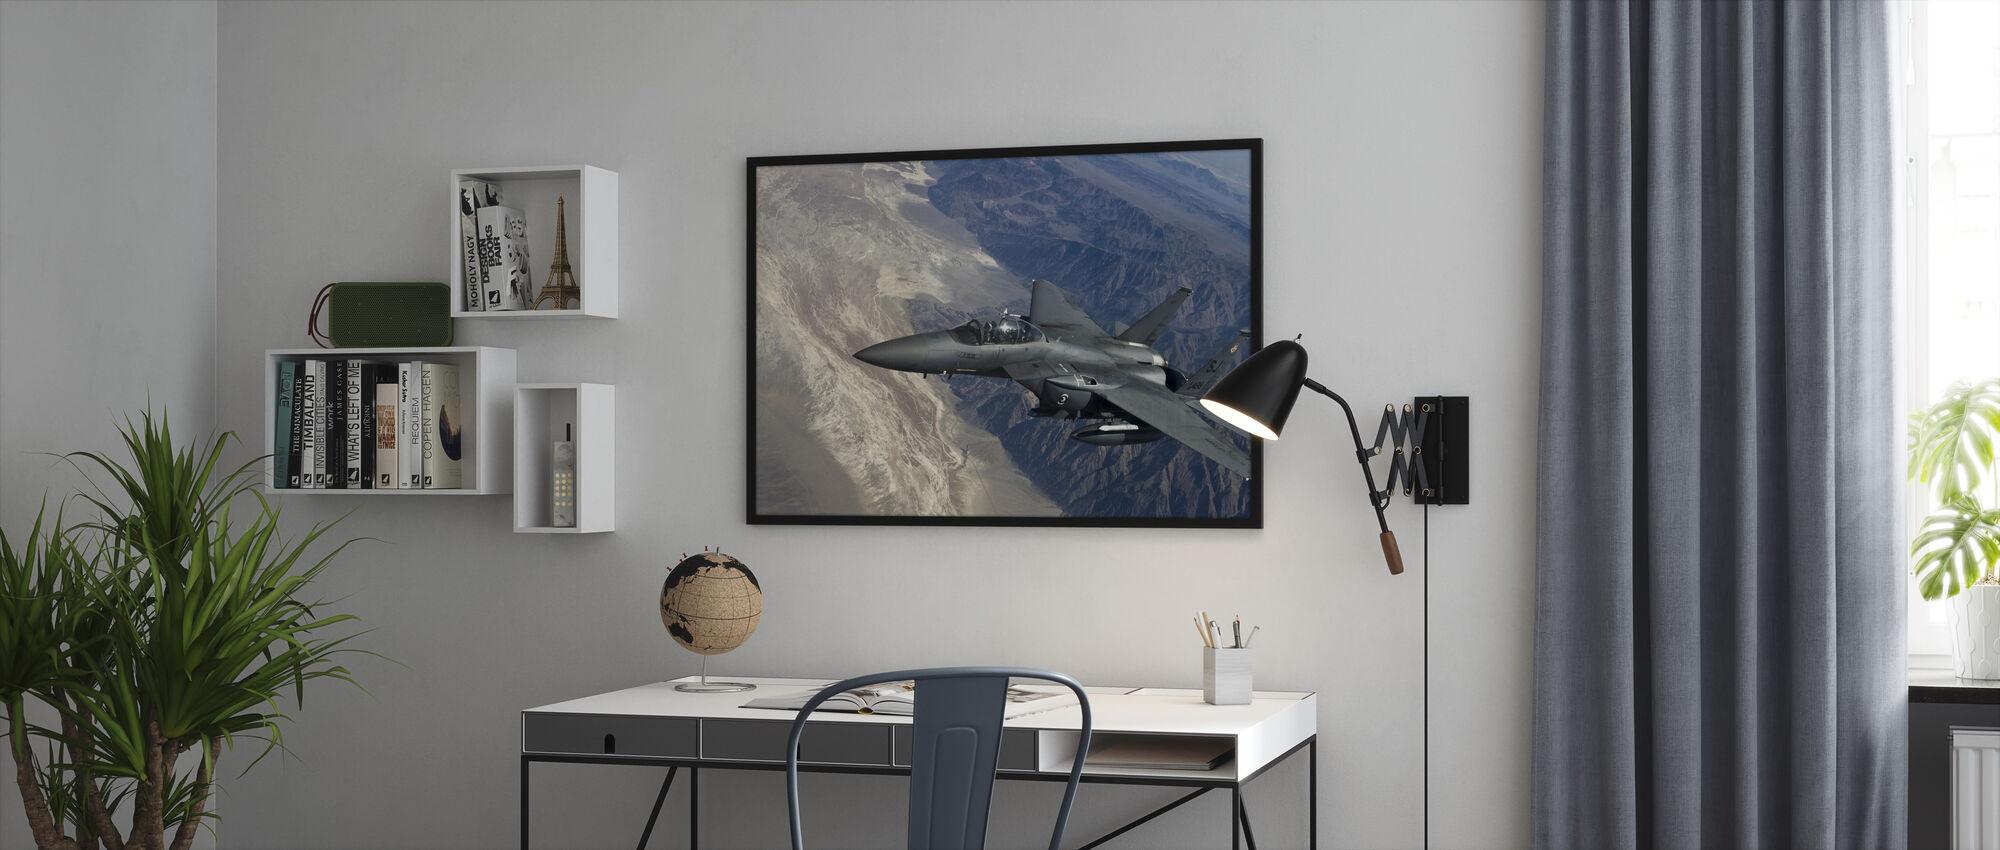 Luftbårne Fighter Jet - Innrammet bilde - Kontor